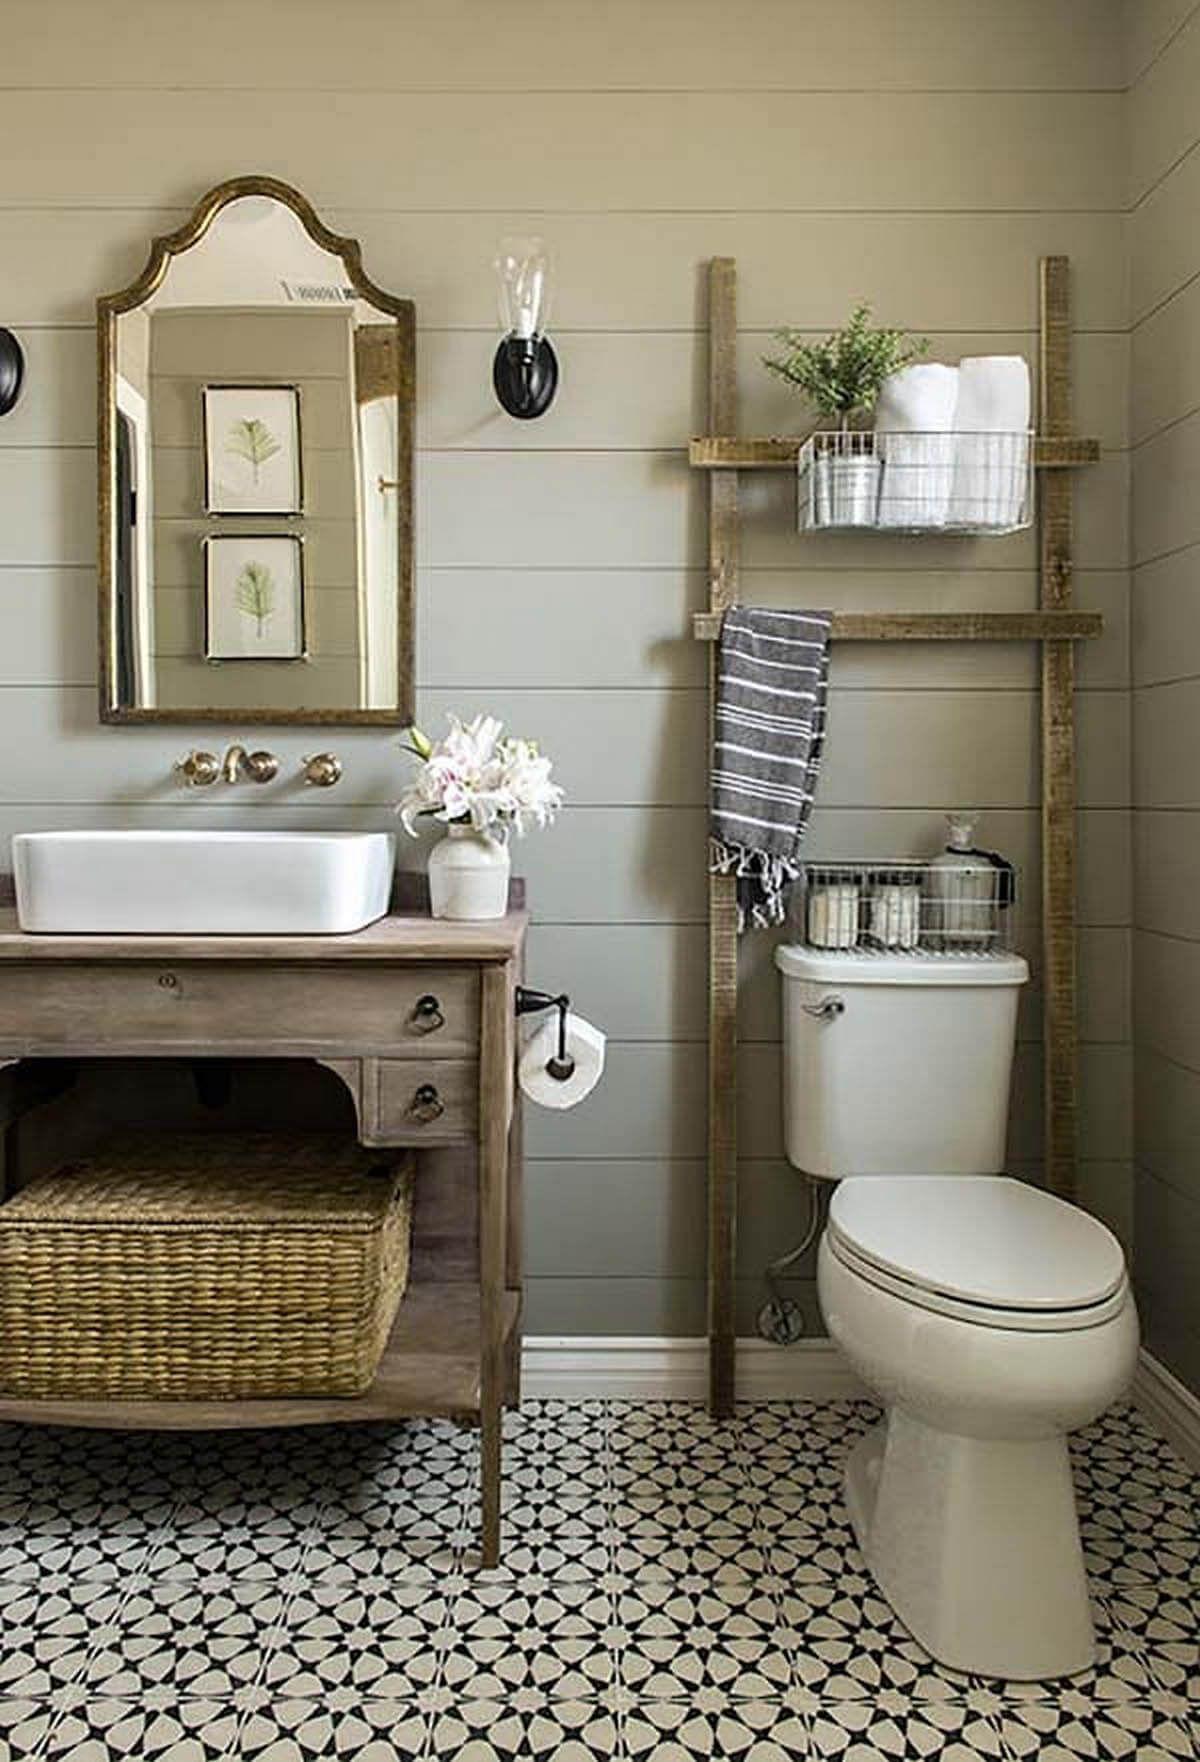 Bathroom Design Go | 36 Beautiful Farmhouse Bathroom Design And Decor Ideas You Will Go